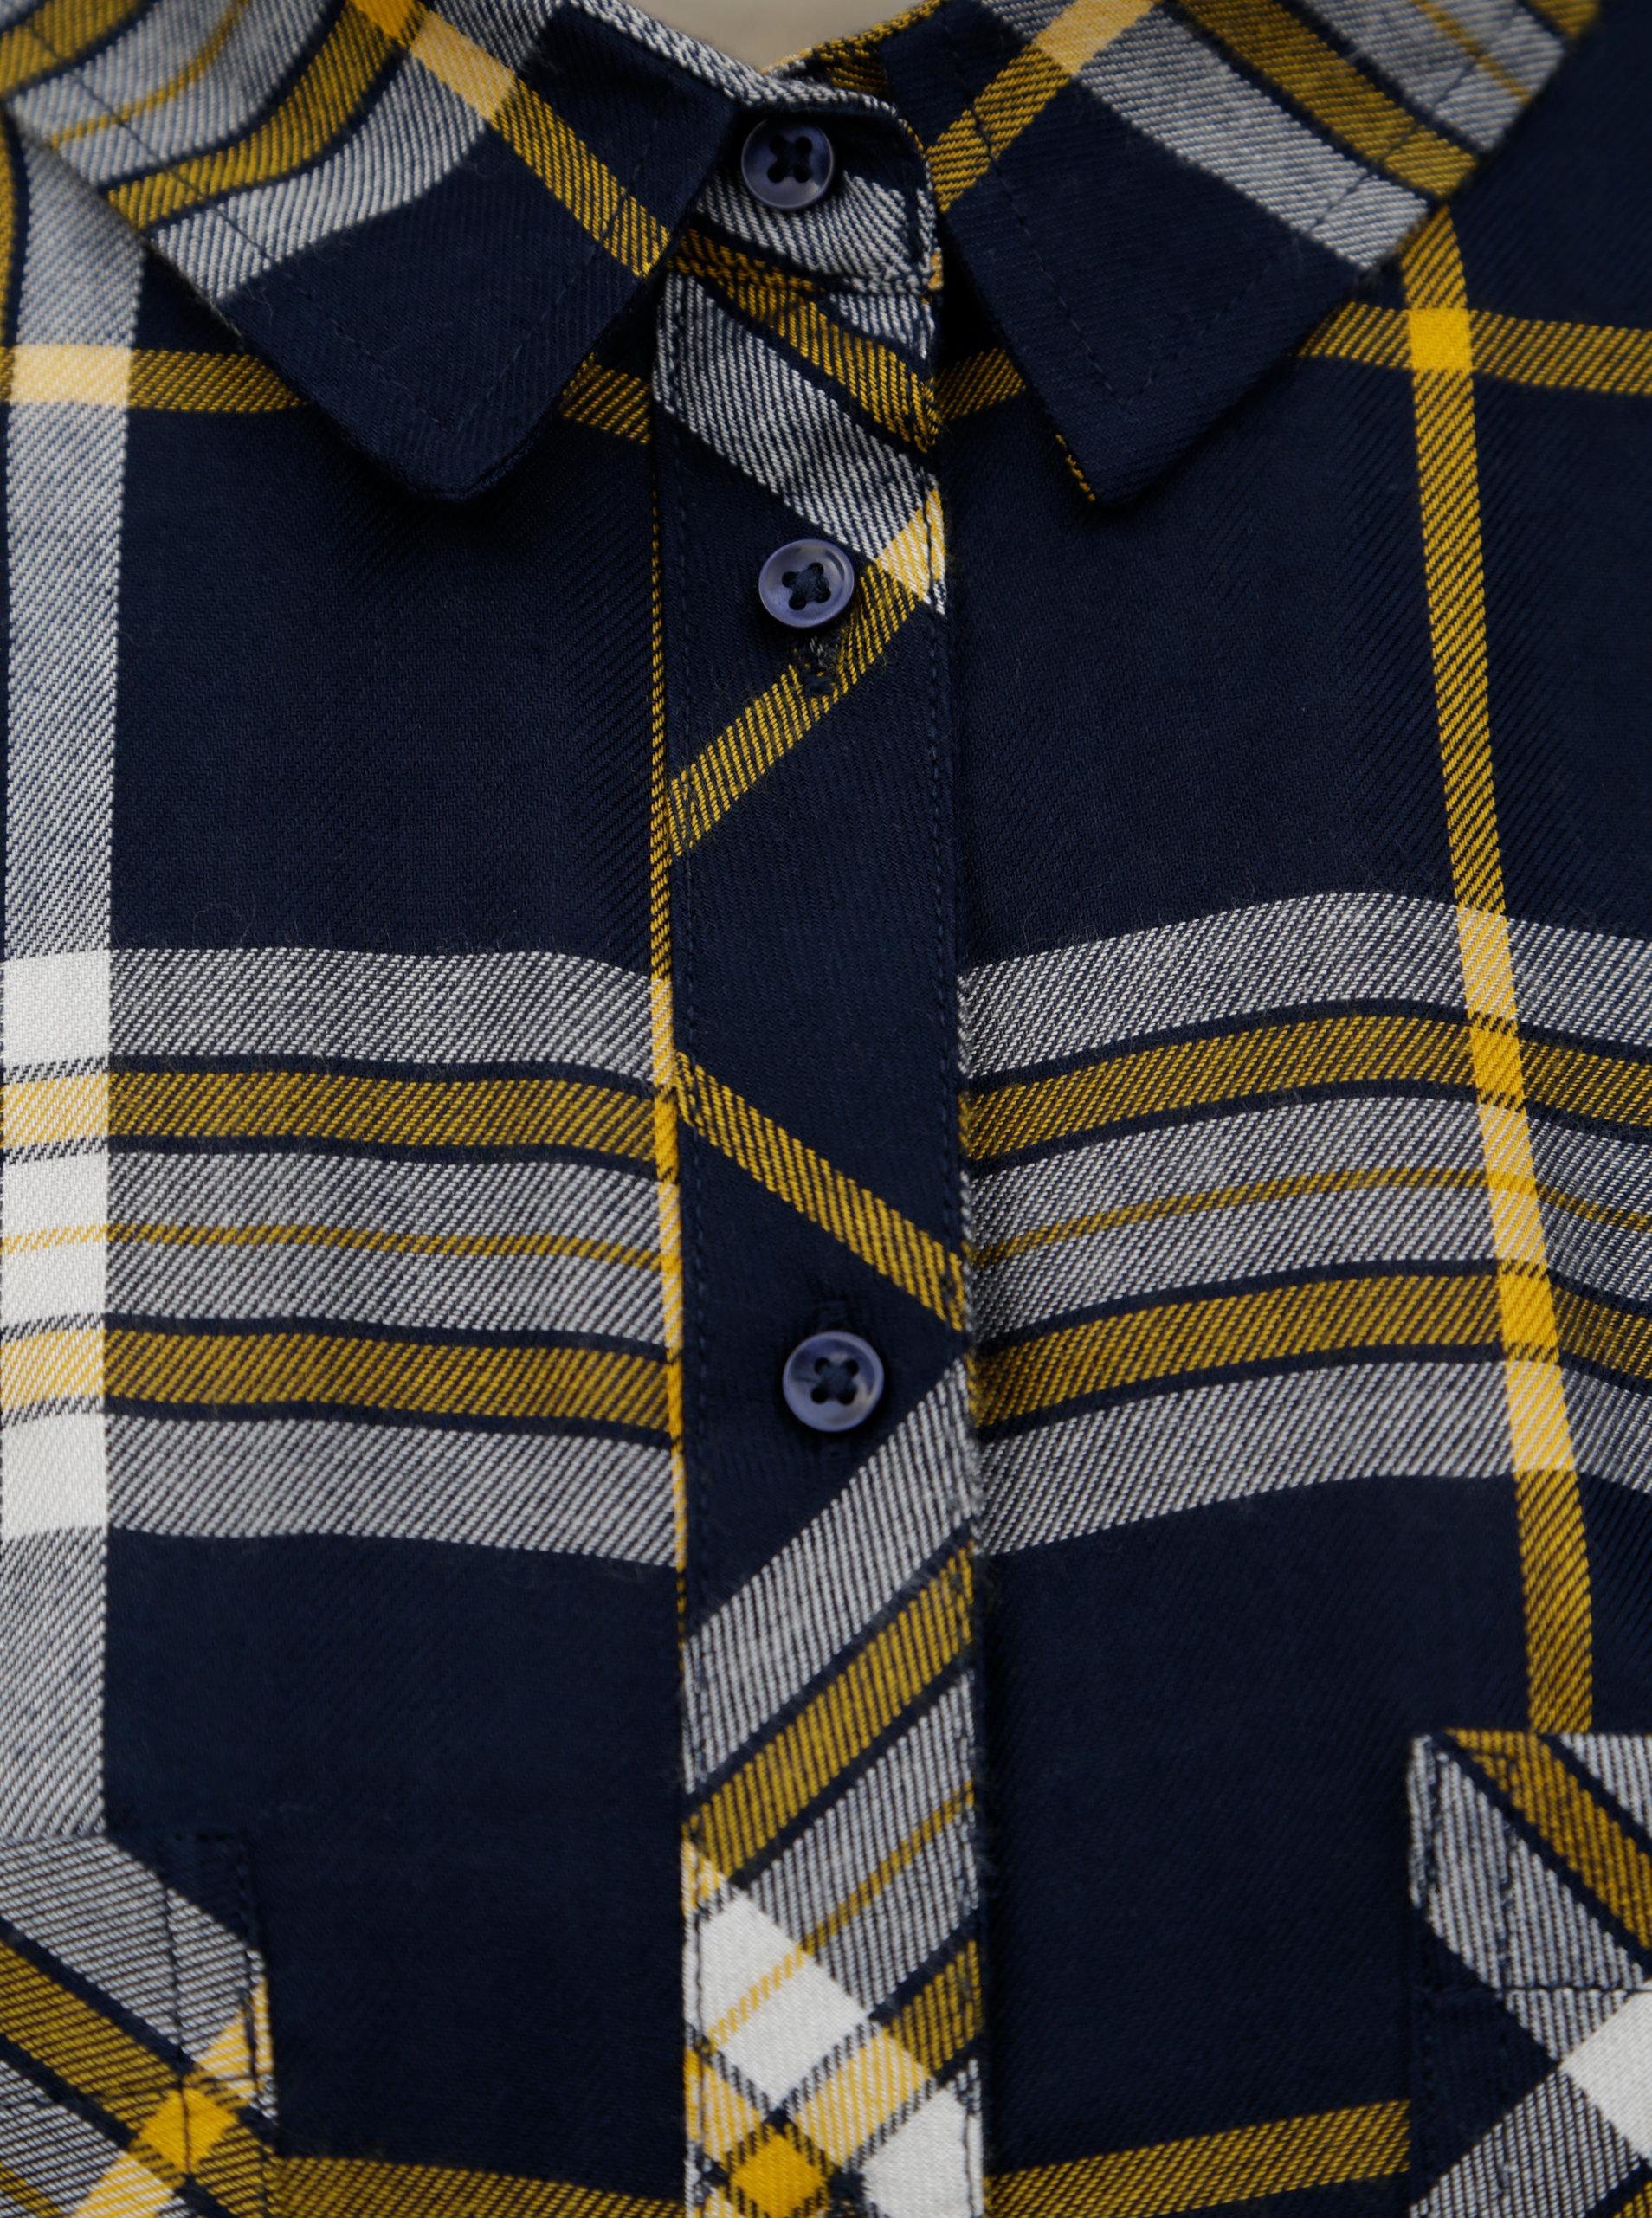 Žluto-modrá kostkovaná košile TALLY WEiJL ... 59692028c4